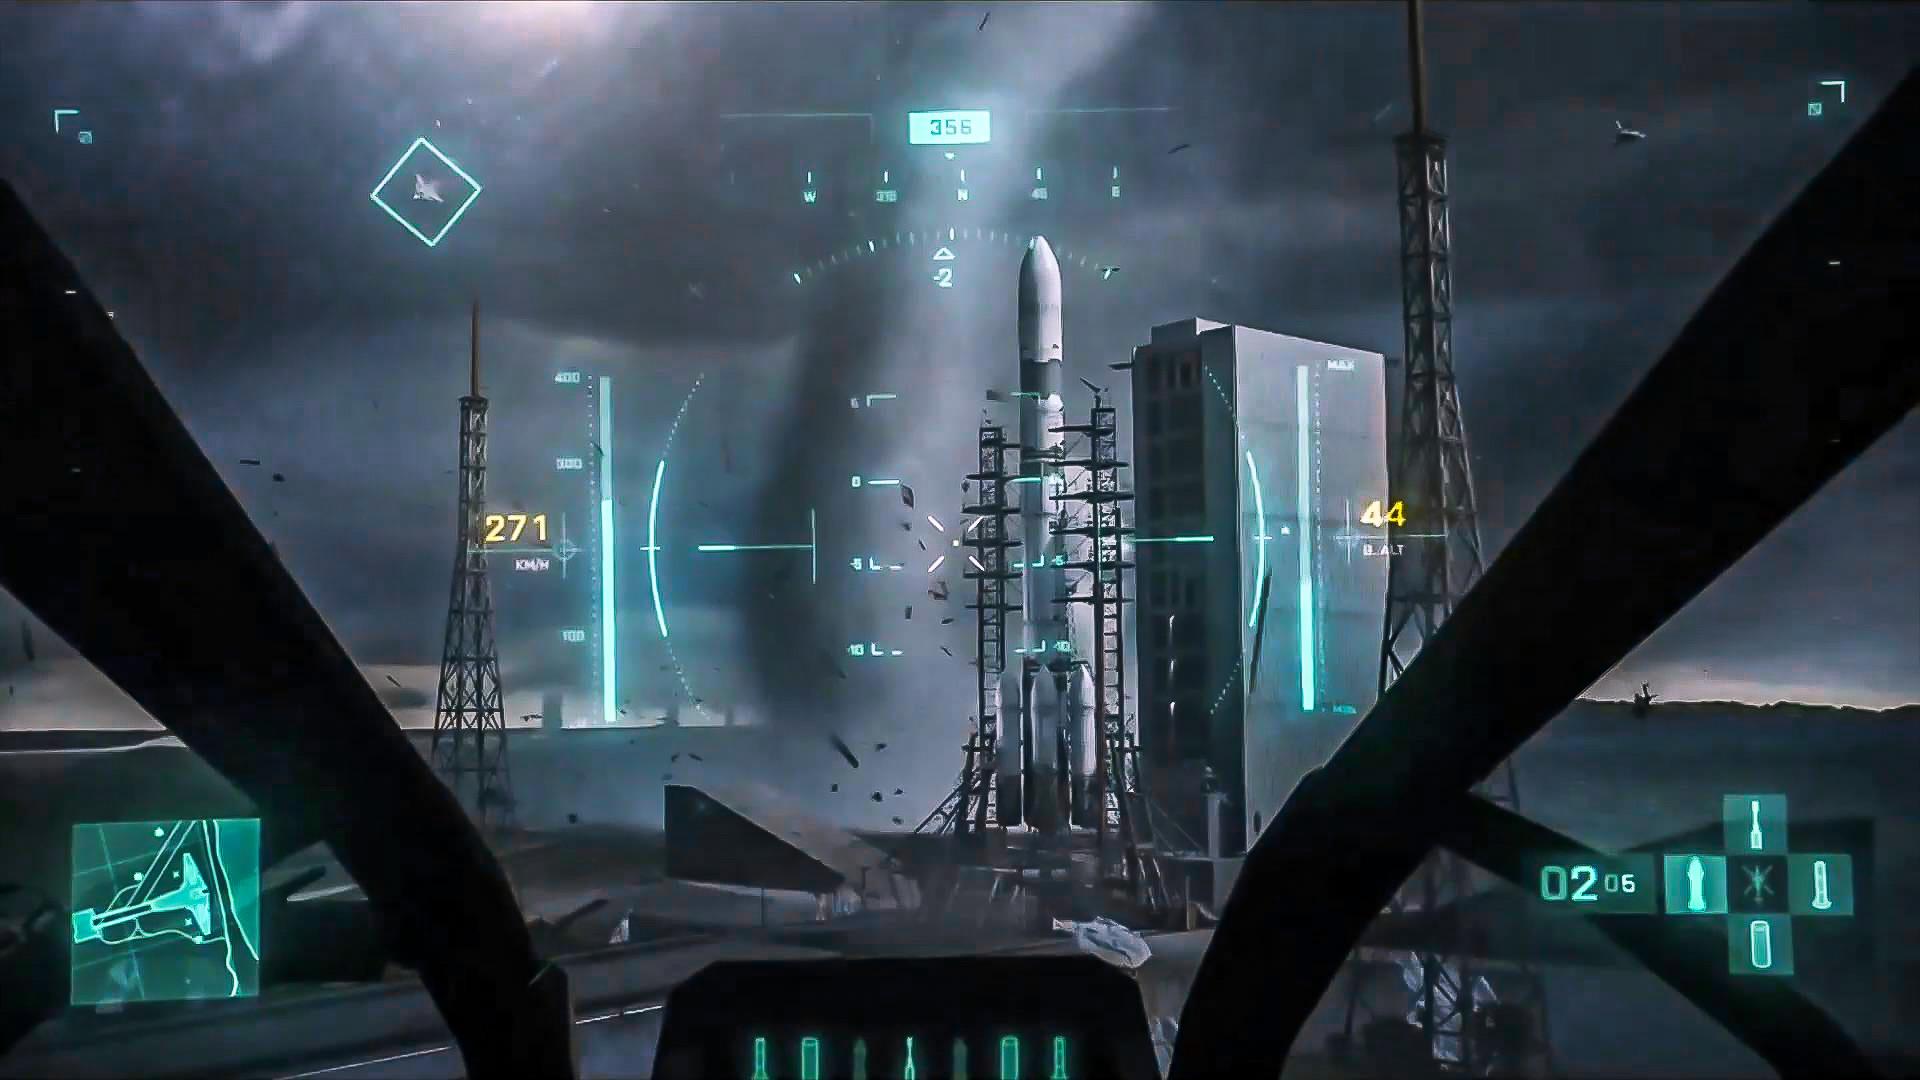 Battlefield Screenshot Leak